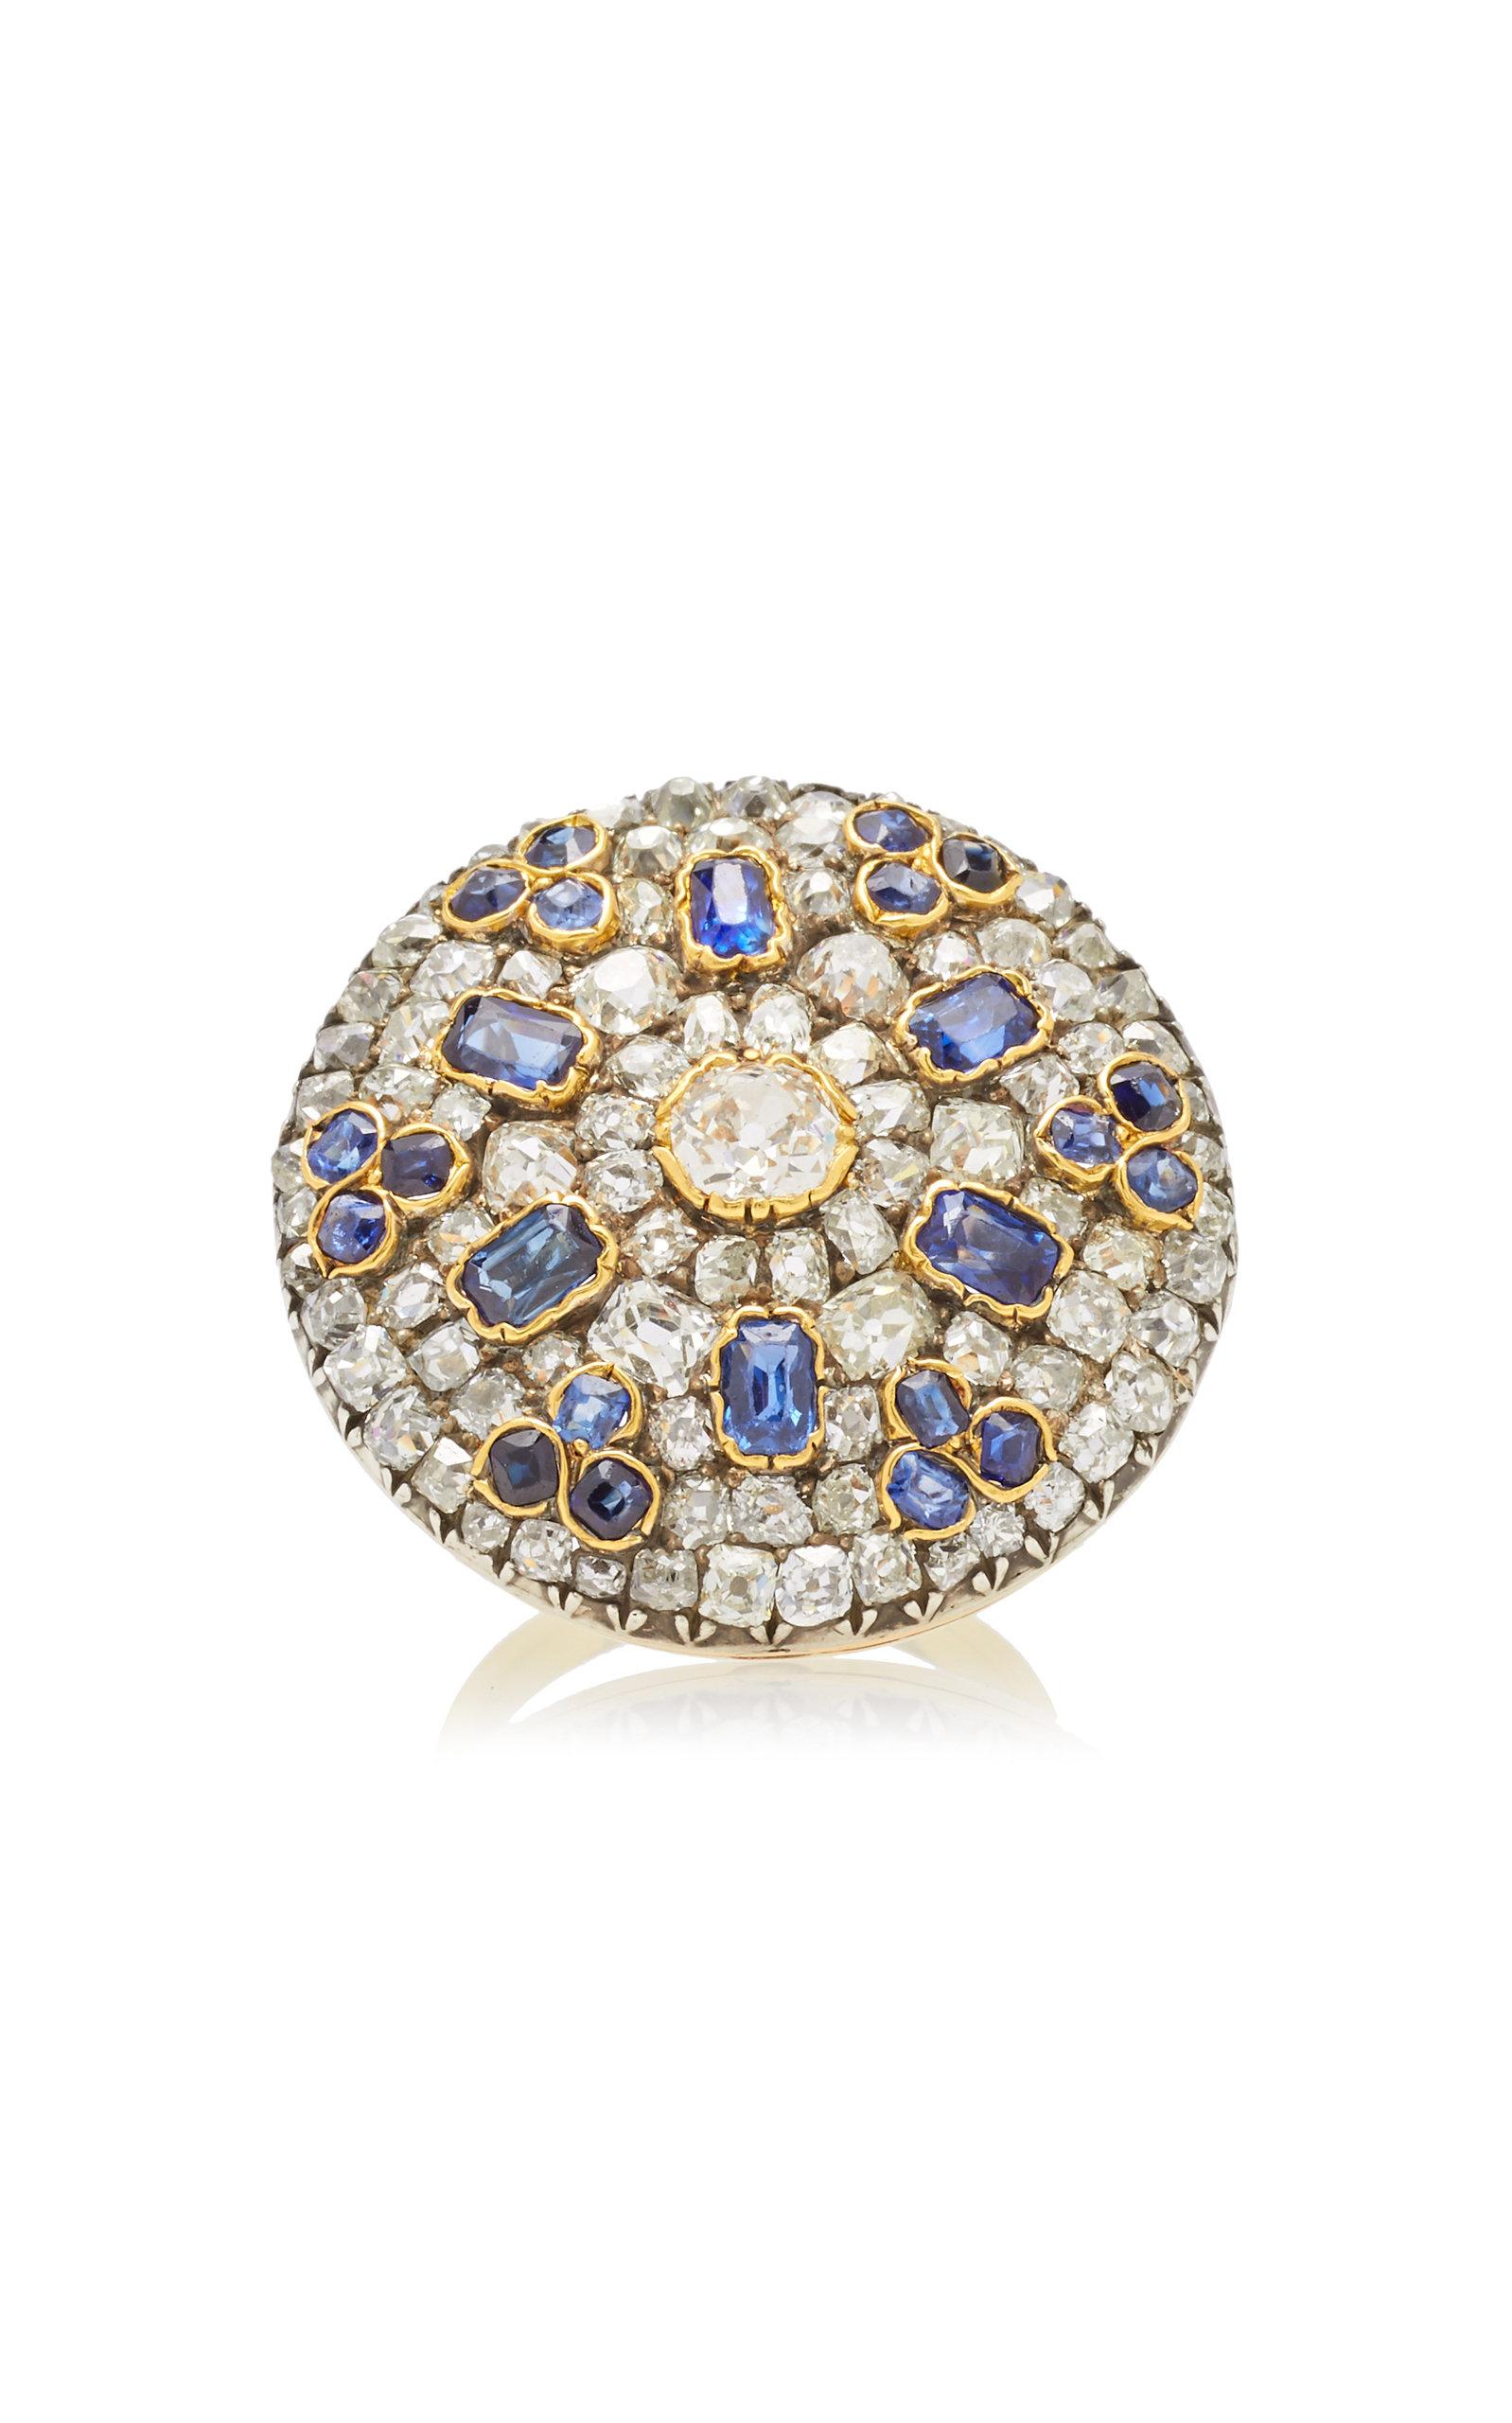 229f6618643ec Diamond Sapphire Old Cut Ring